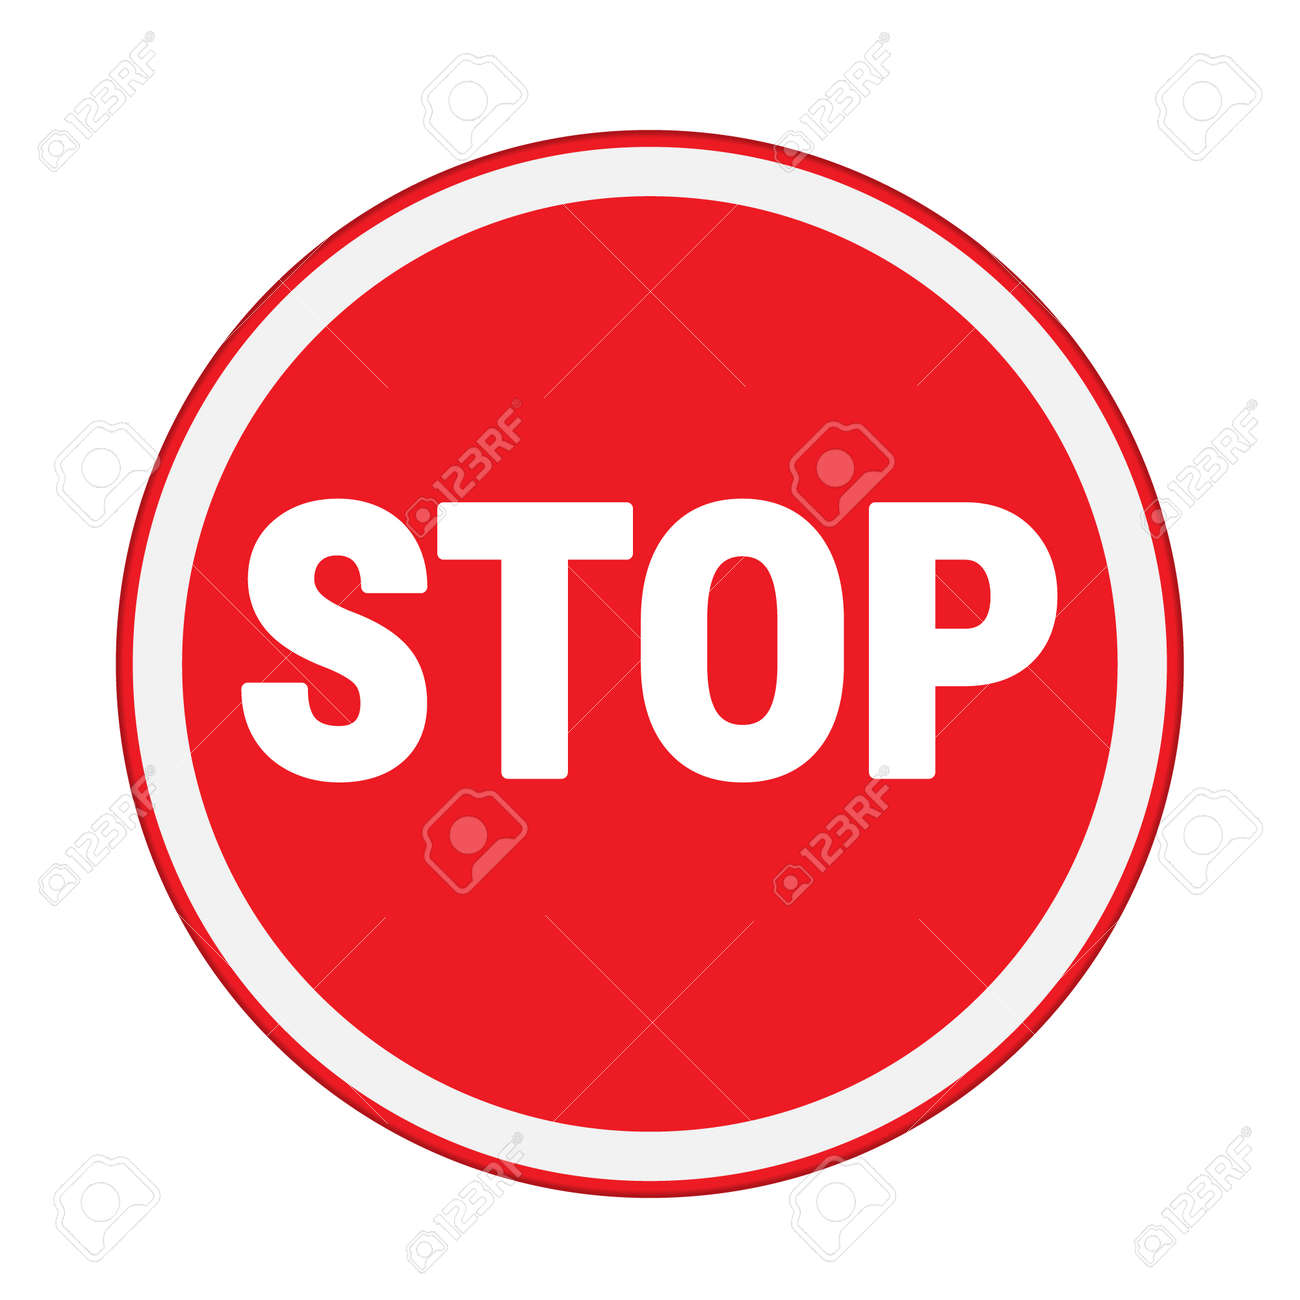 traffic sign stop sign circle isolated road warning royalty free rh 123rf com stop sign car logo stop sign logo design